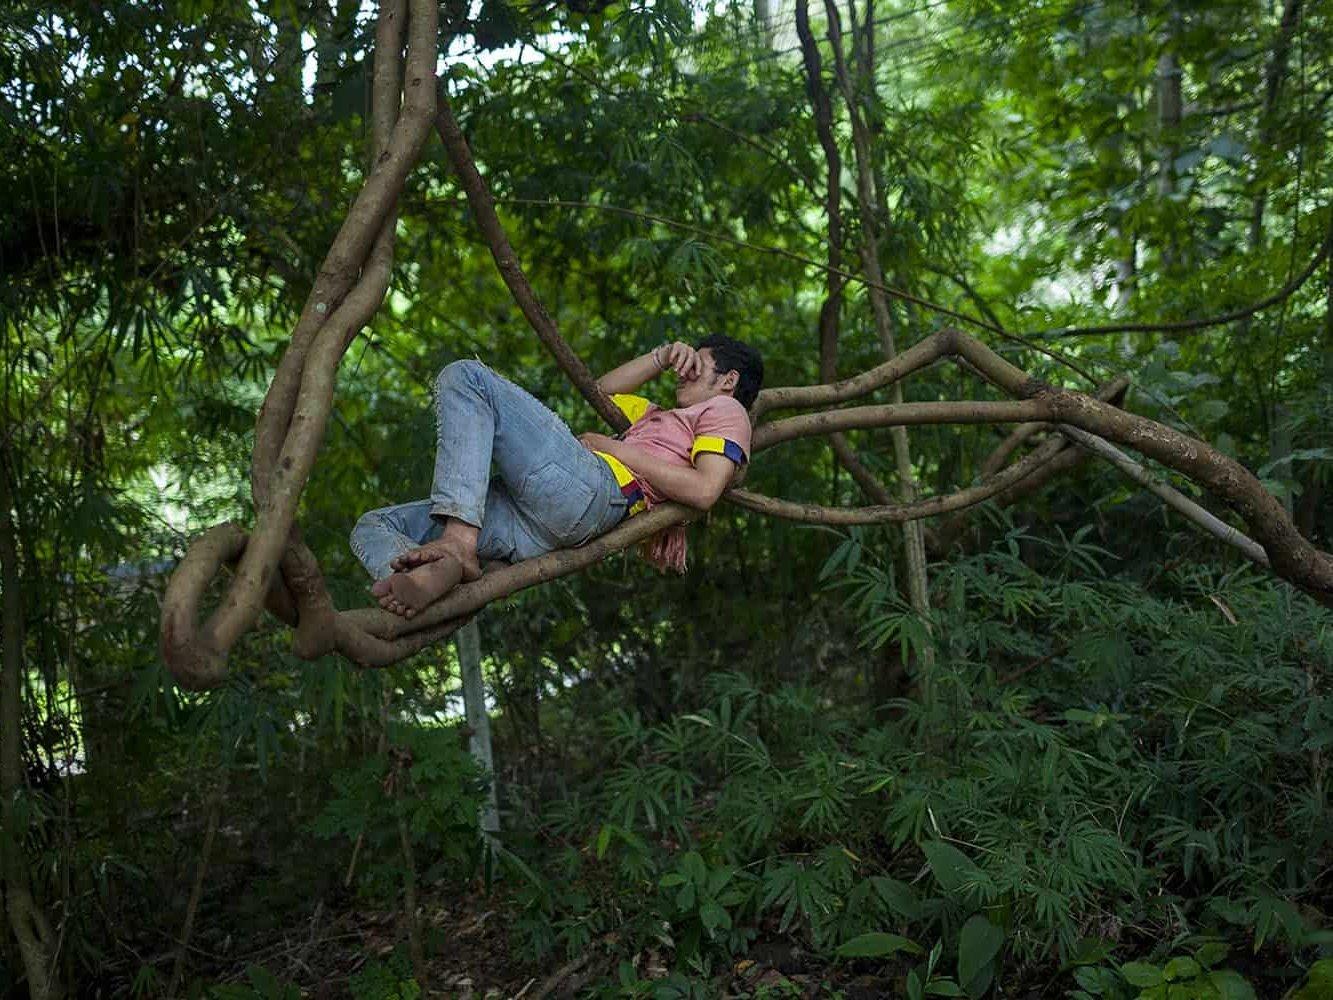 vietnam photographer mahout family binhdang 10